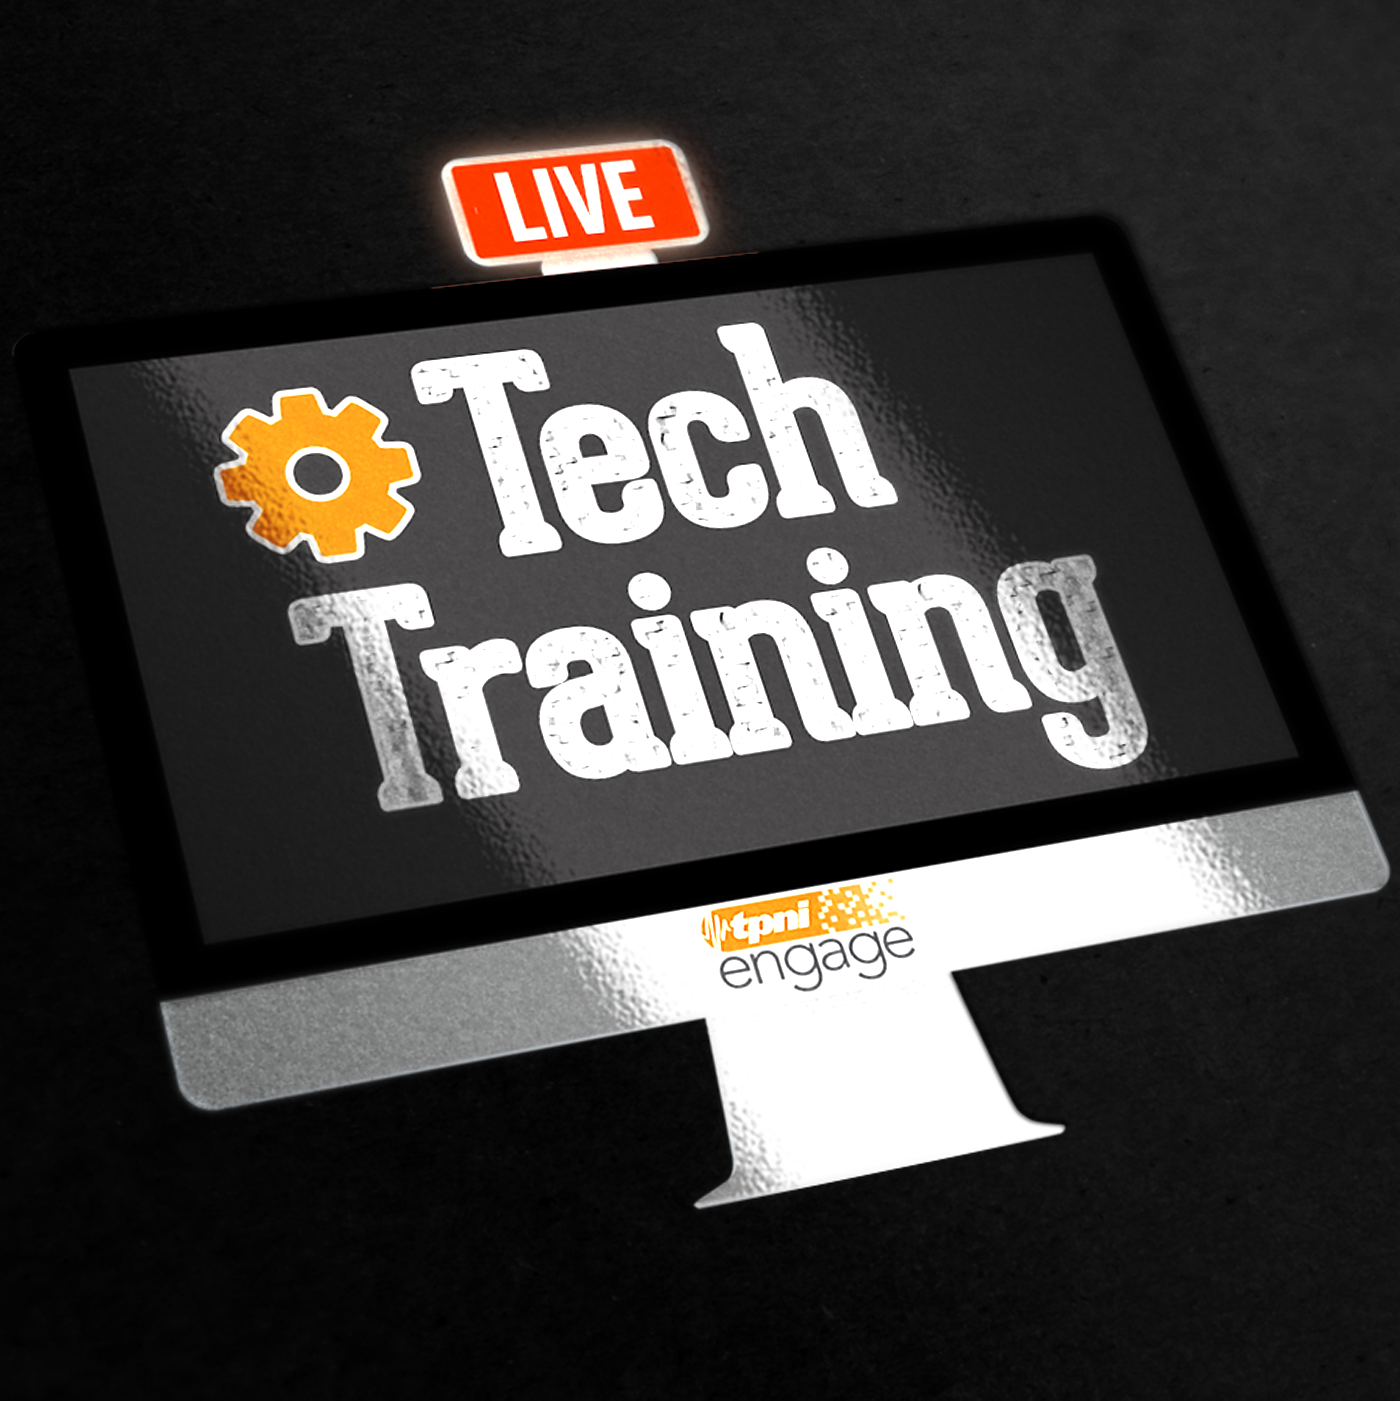 <![CDATA[TPNI Engage - Tech Training]]>